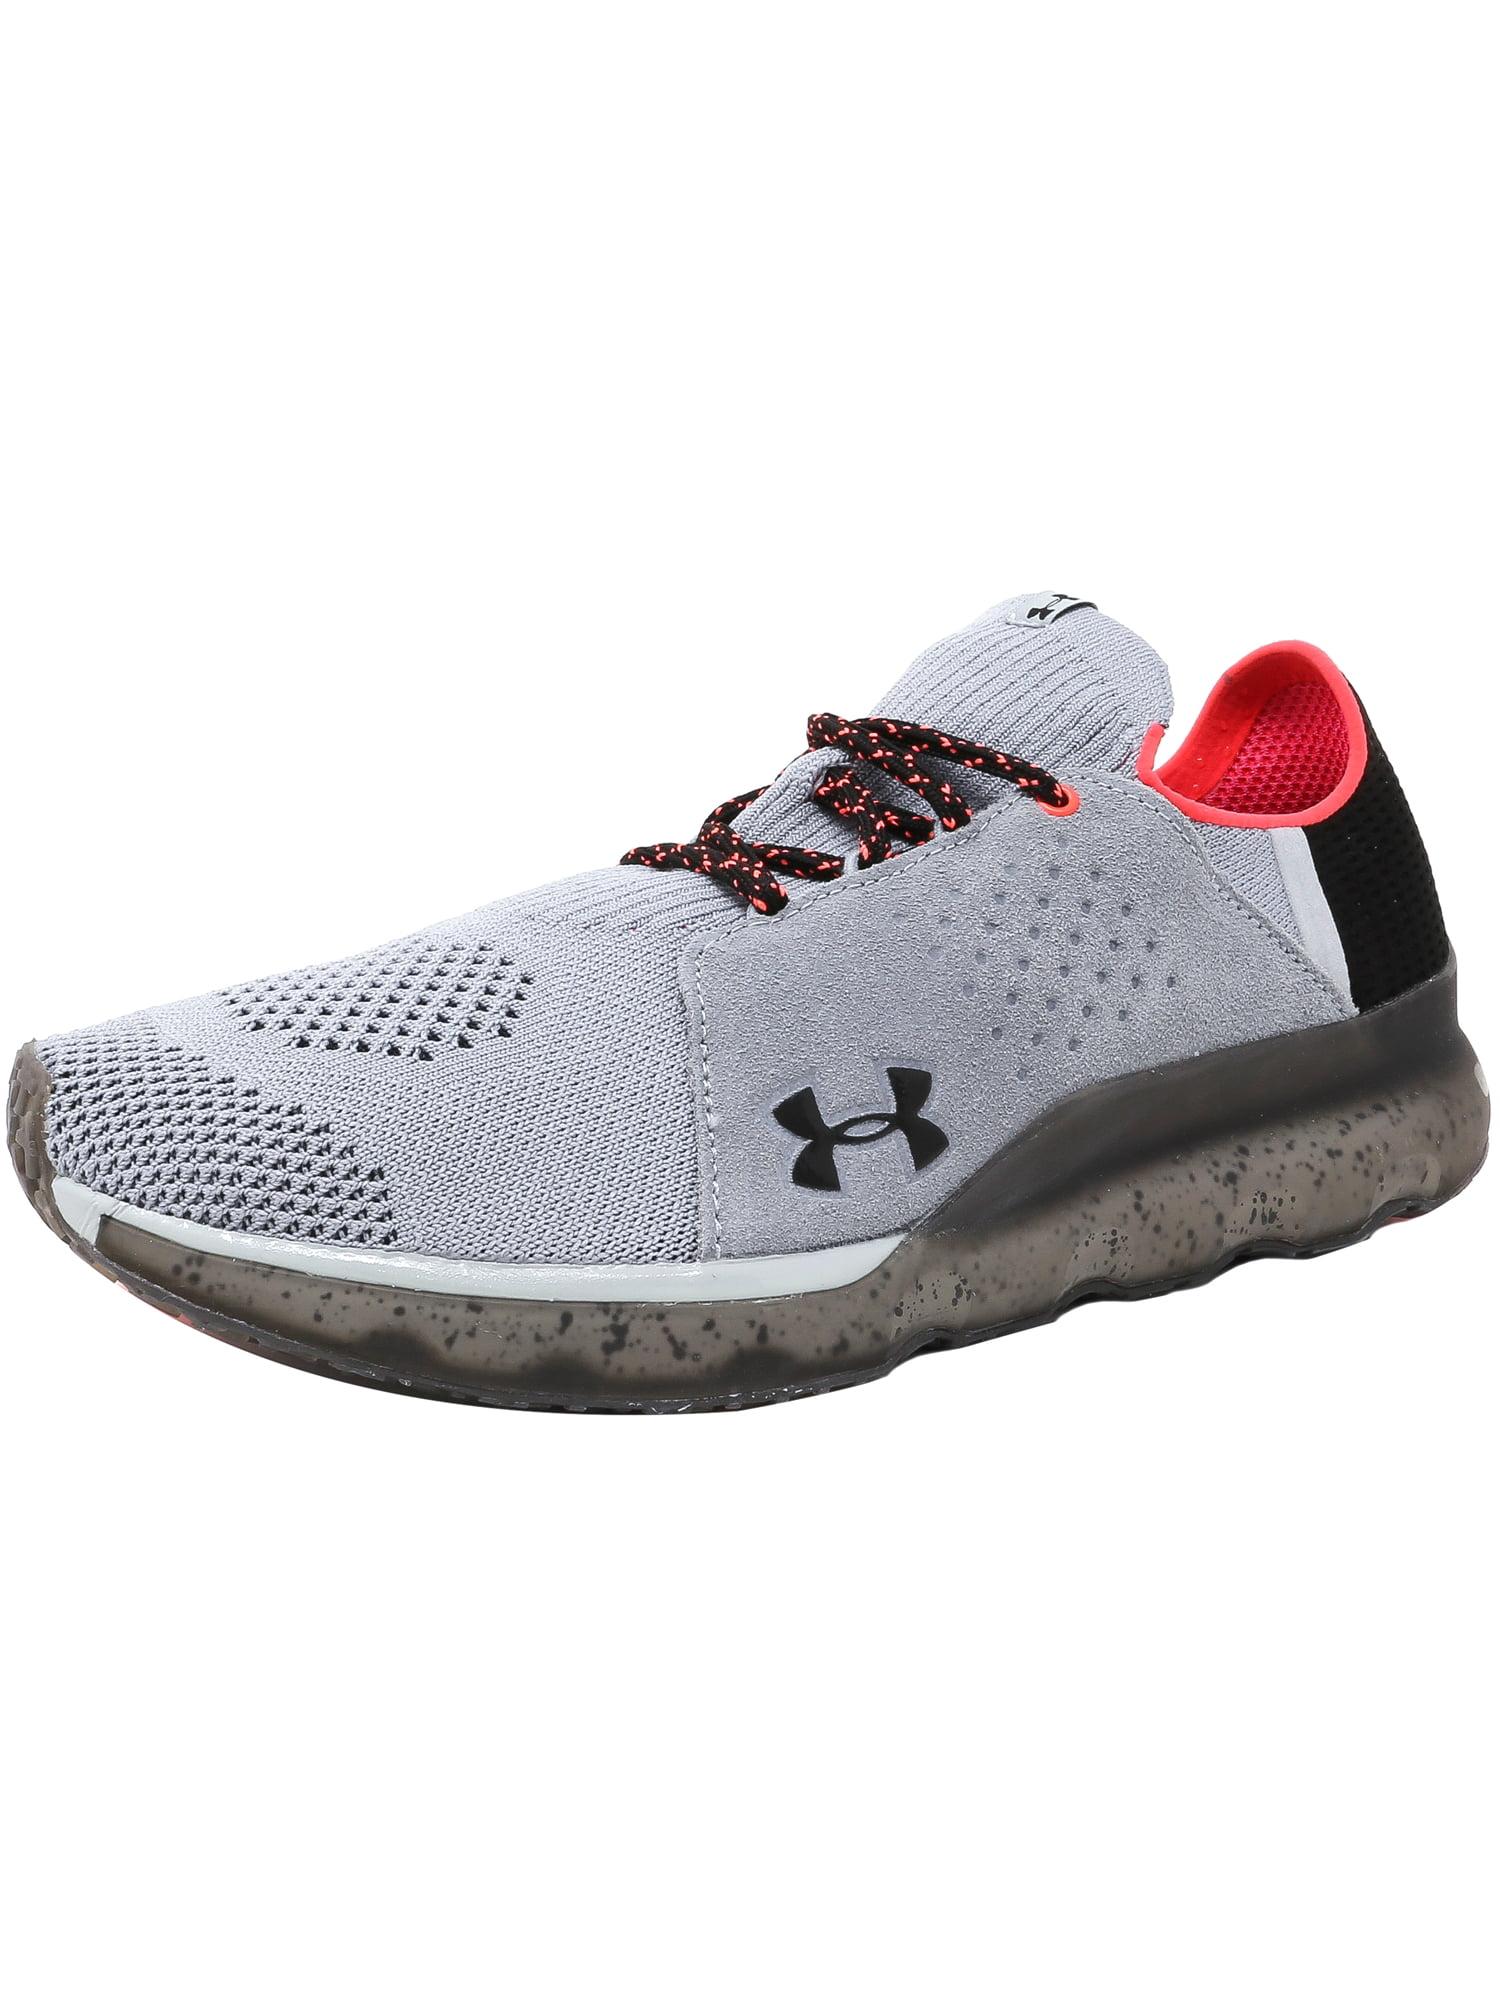 Under Armour Men's Threadborne Reveal Overcast Gray / Marathon Red Black Ankle-High Fabric Training Shoes - 8M